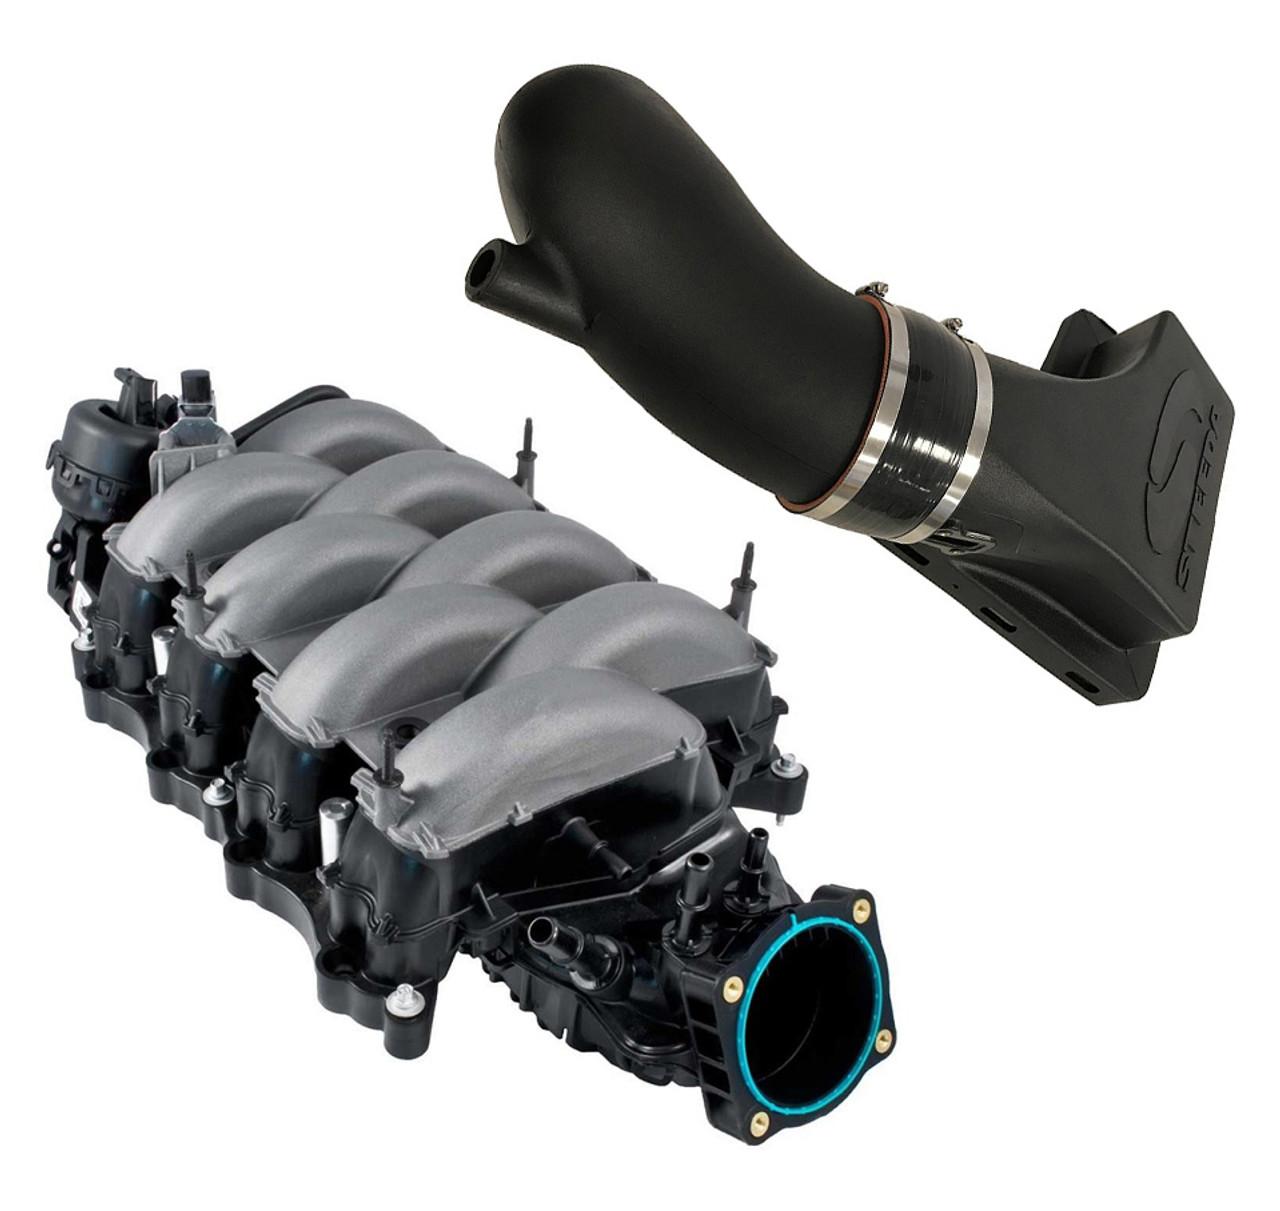 Ported 2018 Mustang Intake Manifold CAI Combo 2011-2020 Mustang GT